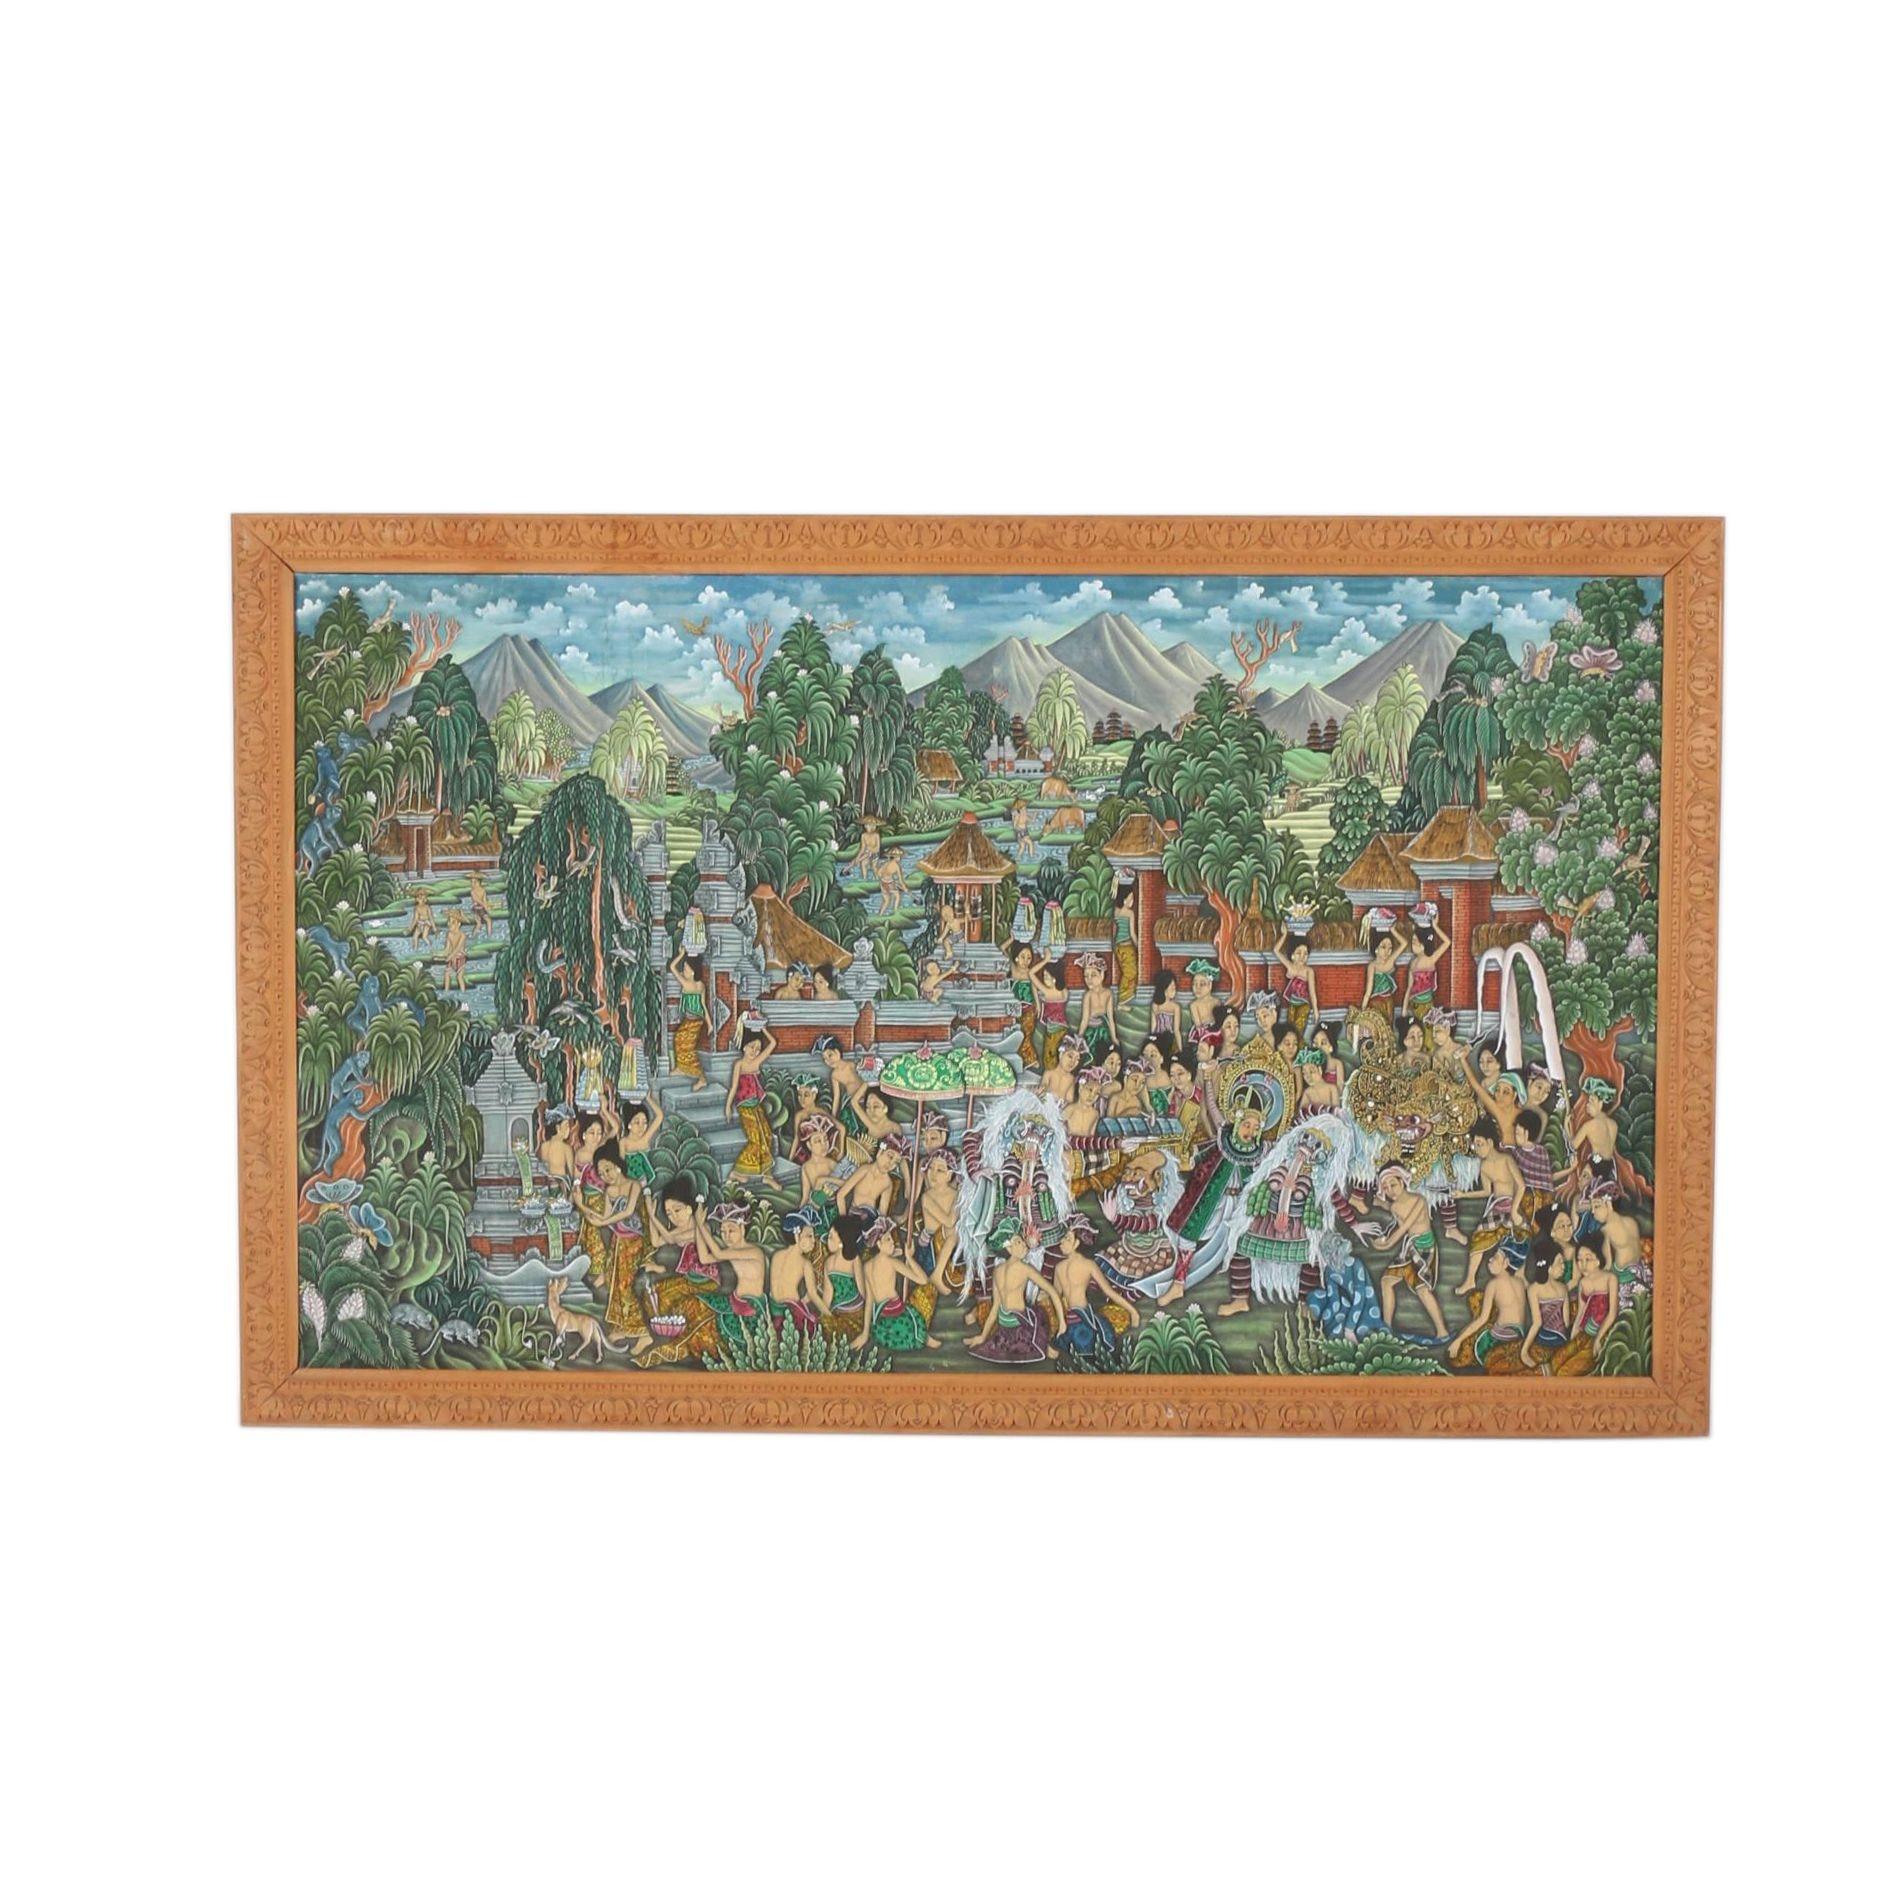 Balinese Acrylic Painting on Cotton Festival Scene